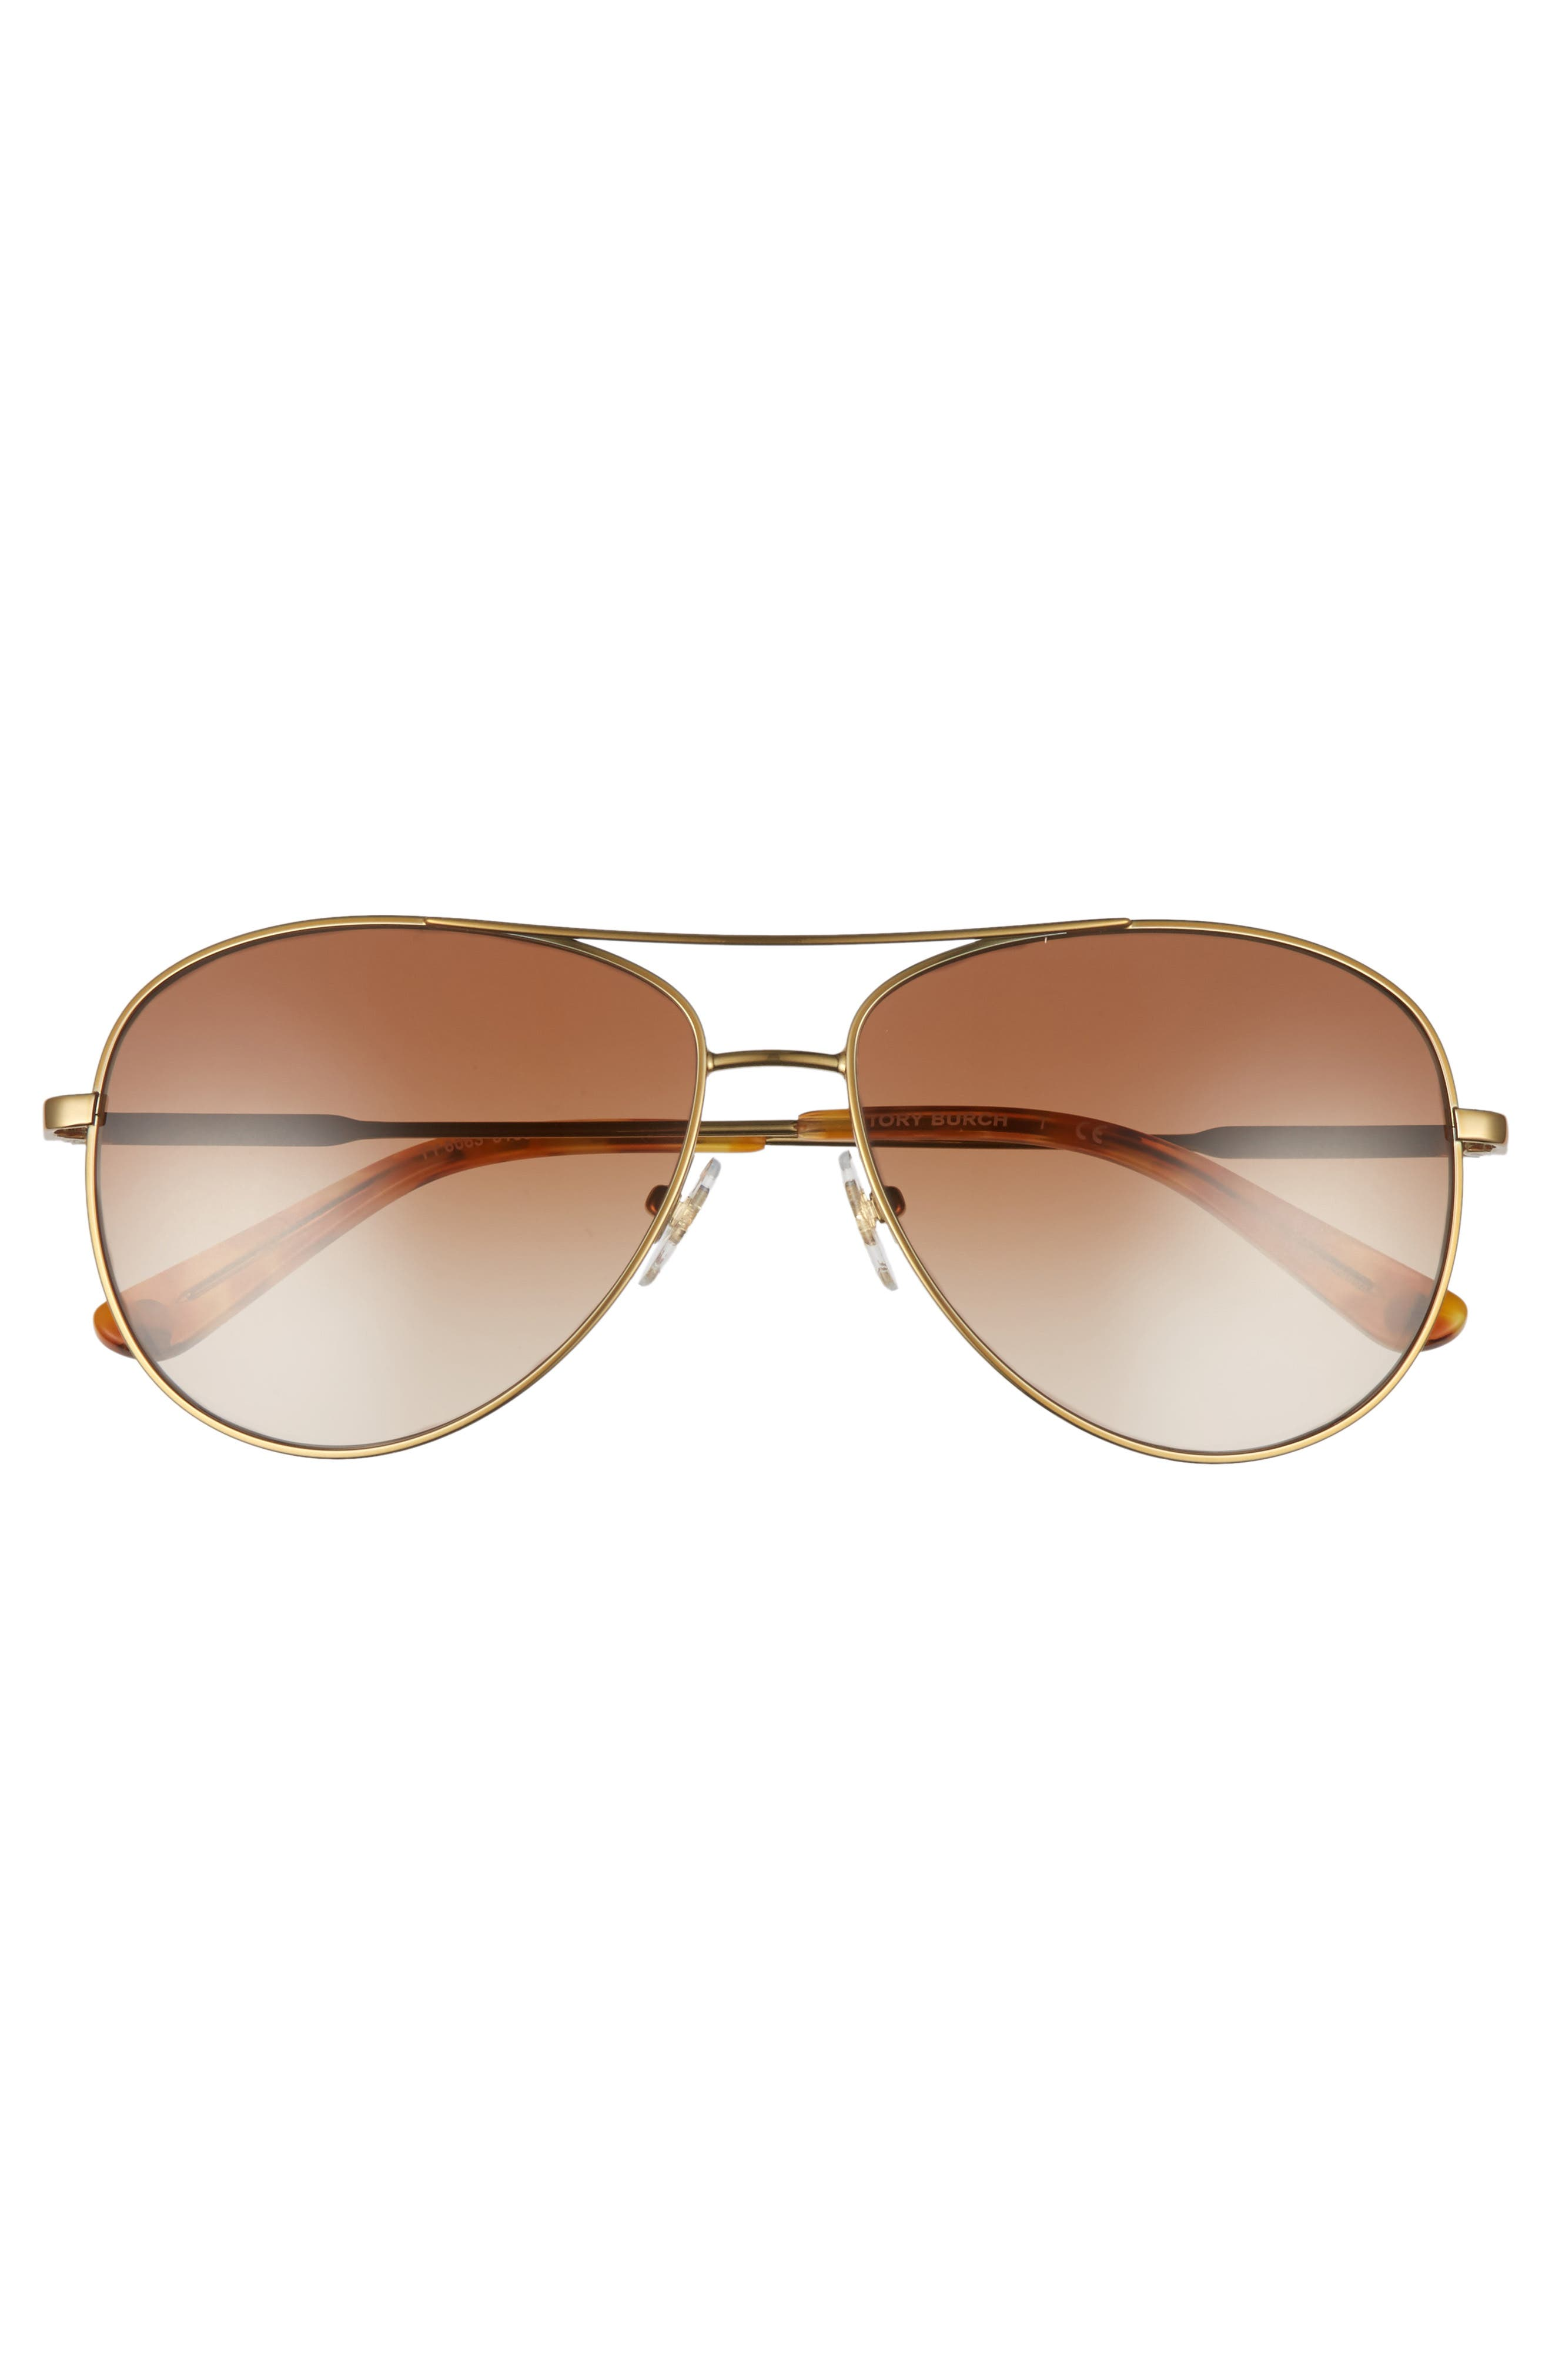 TORY BURCH, 59mm Metal Aviator Sunglasses, Alternate thumbnail 4, color, 710